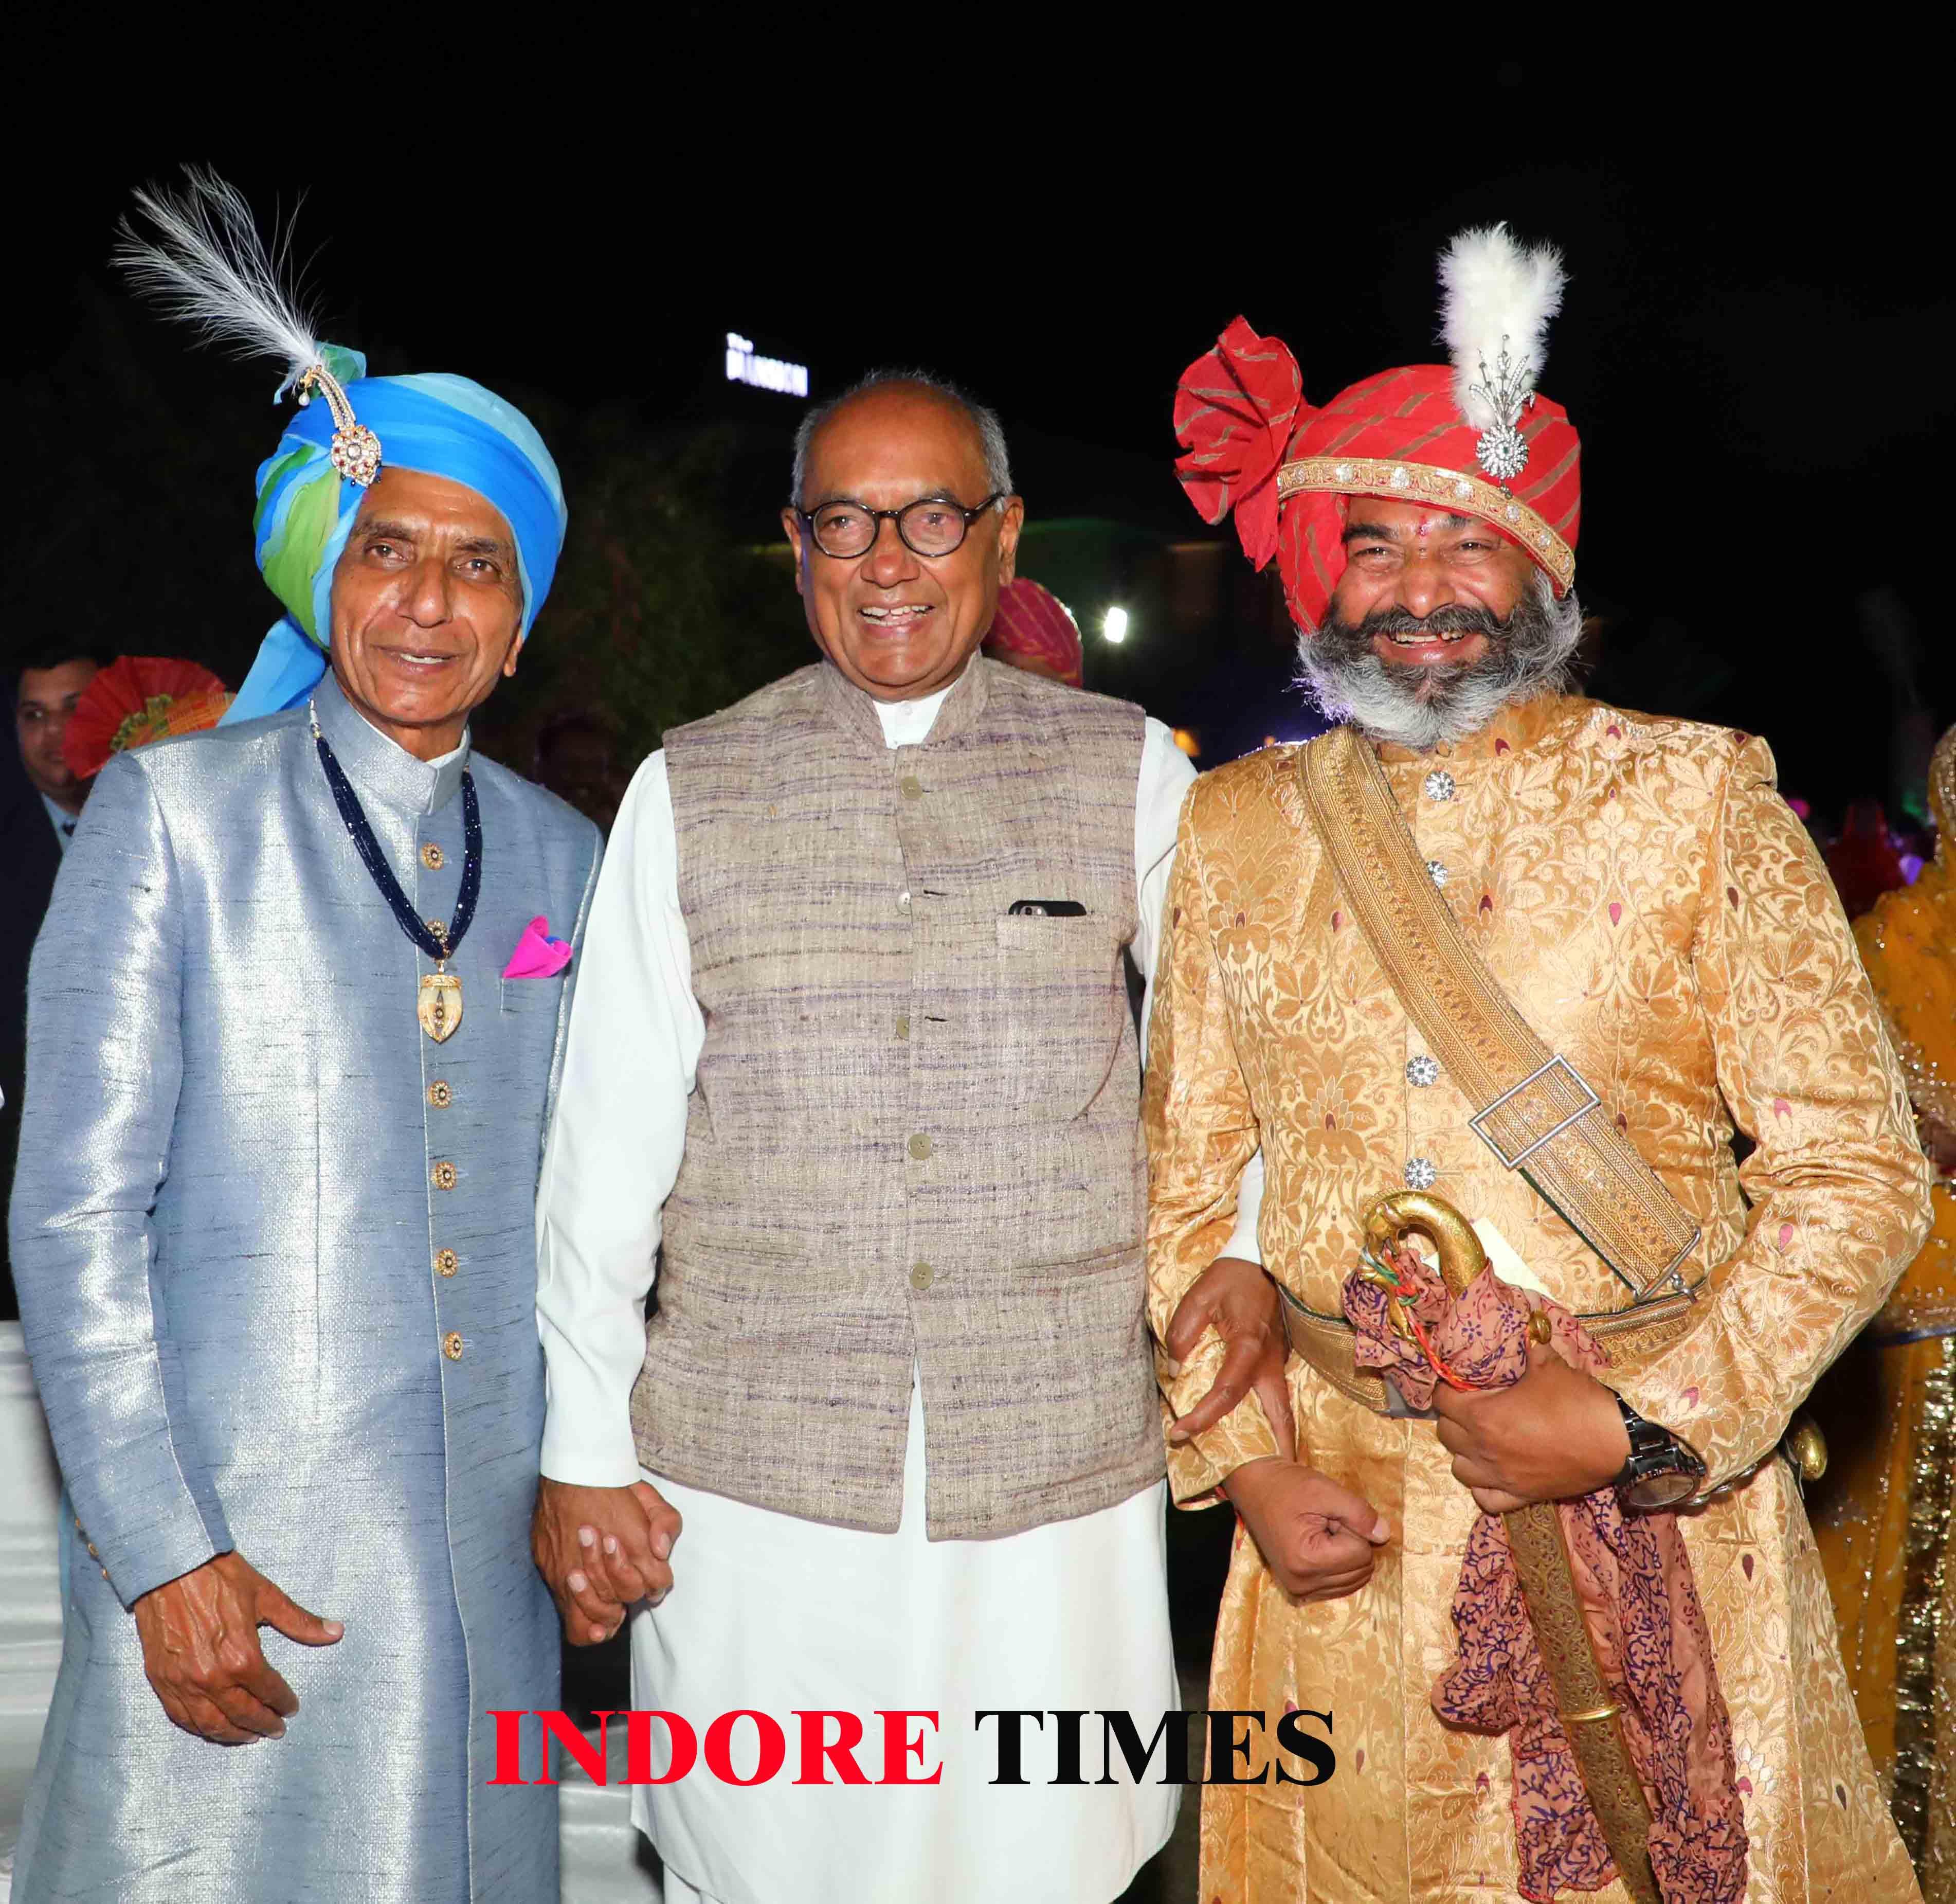 Uncle of the groom, Father Tikka Saheb Amar Singhji of Ramgarh, Former CM Digvijay Singh and Raja Shalivahan Singh Jamniya_edit